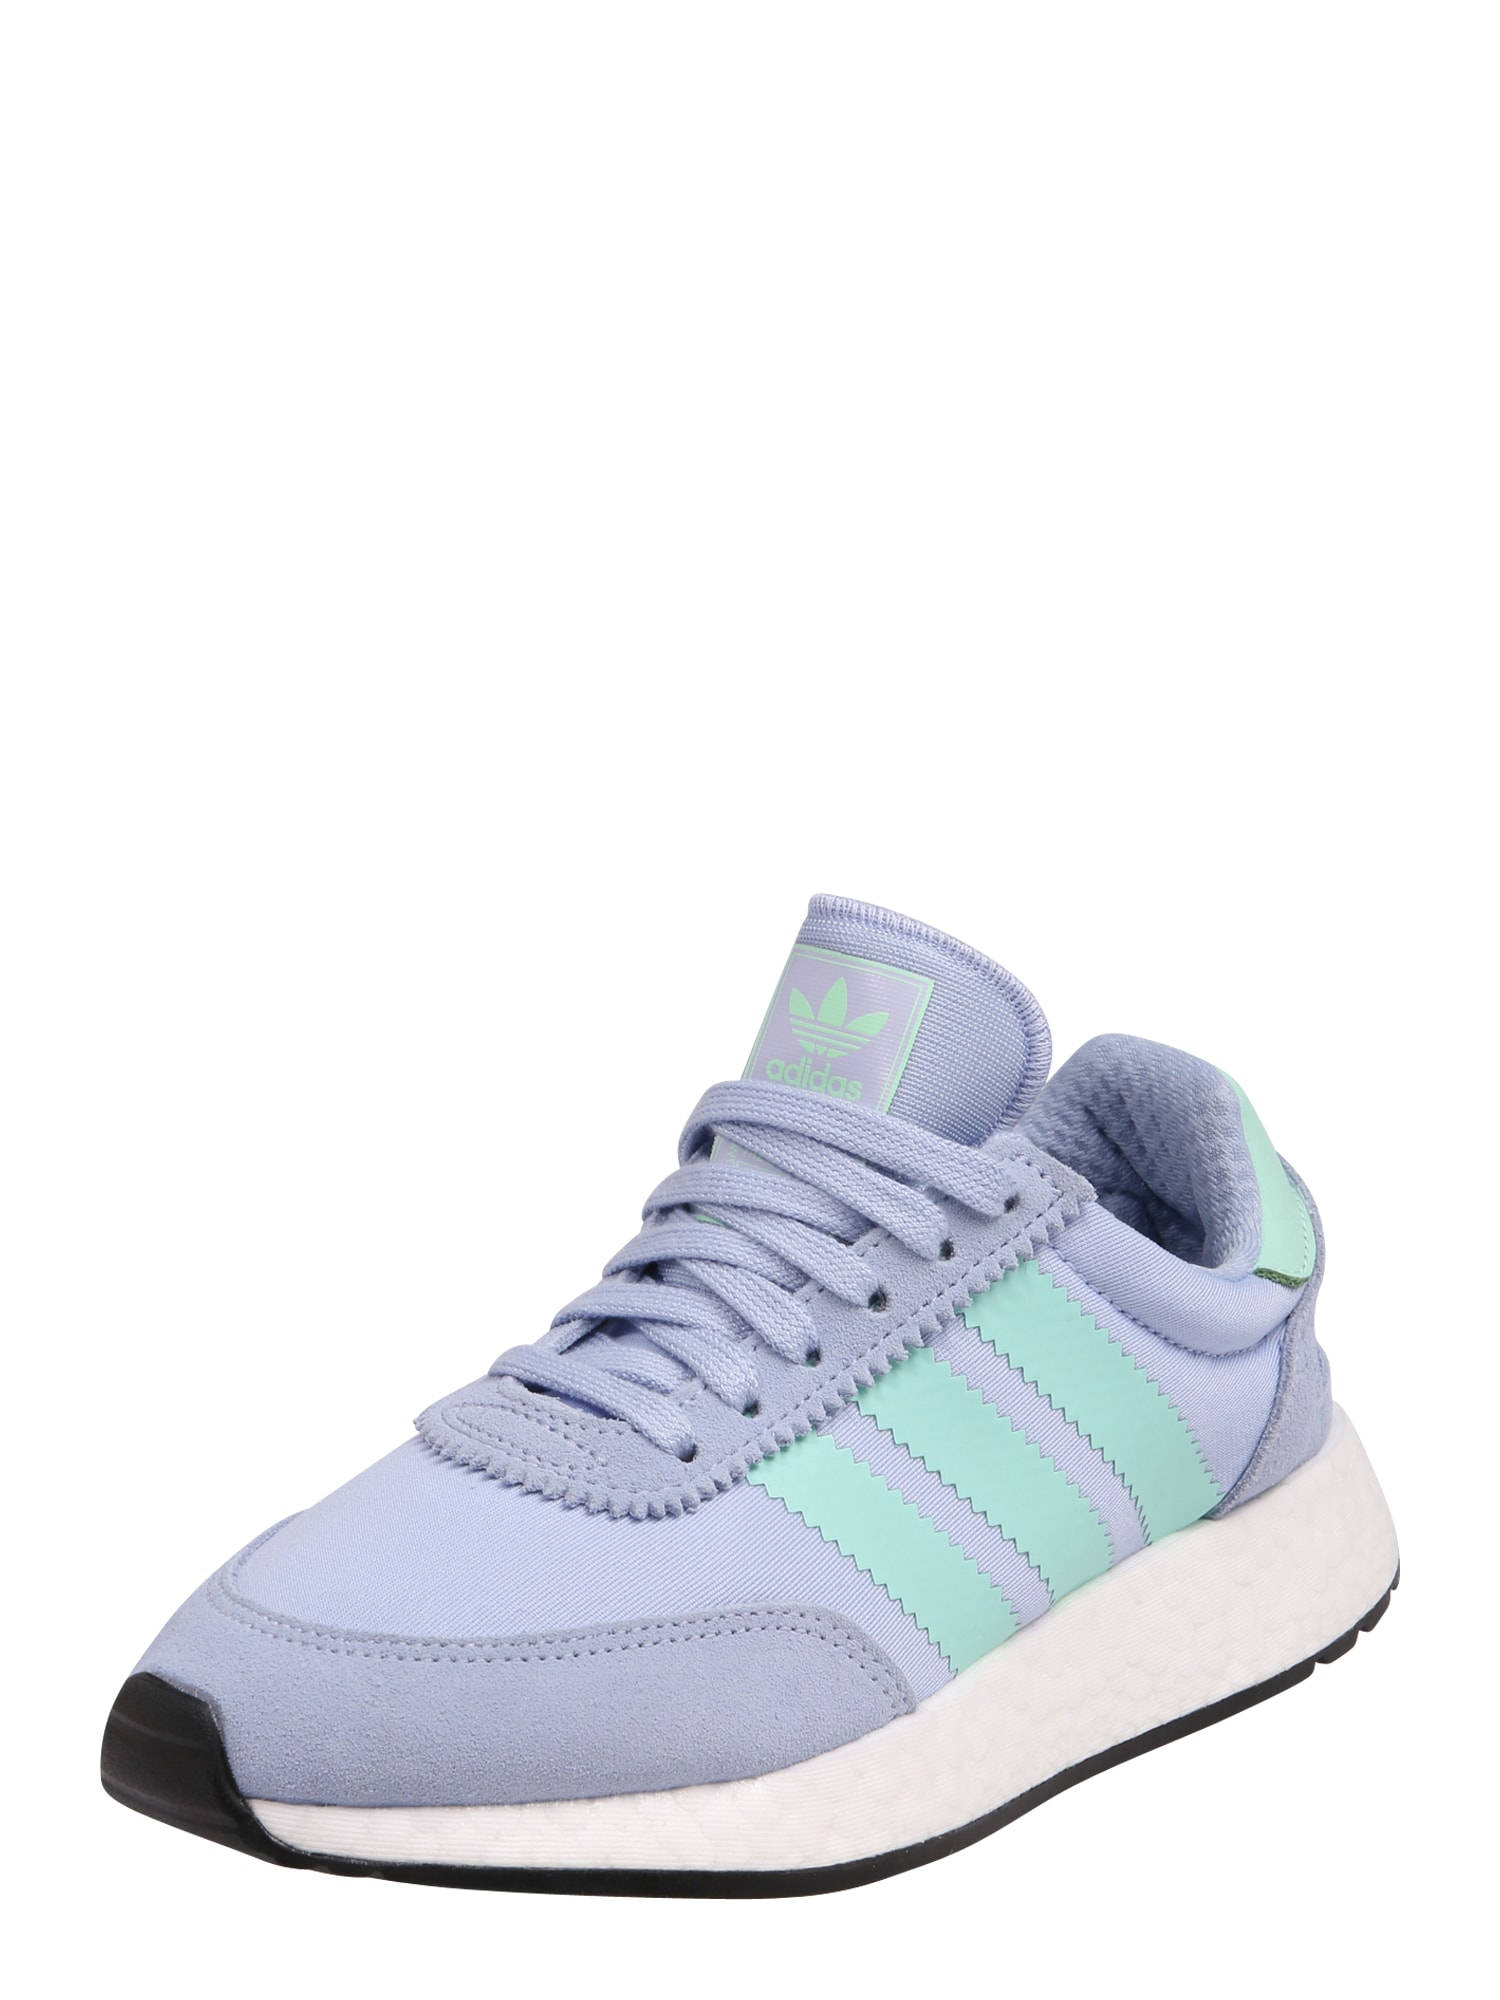 ADIDAS ORIGINALS, Dames Sneakers laag 'I-5923', mintgroen / lichtlila